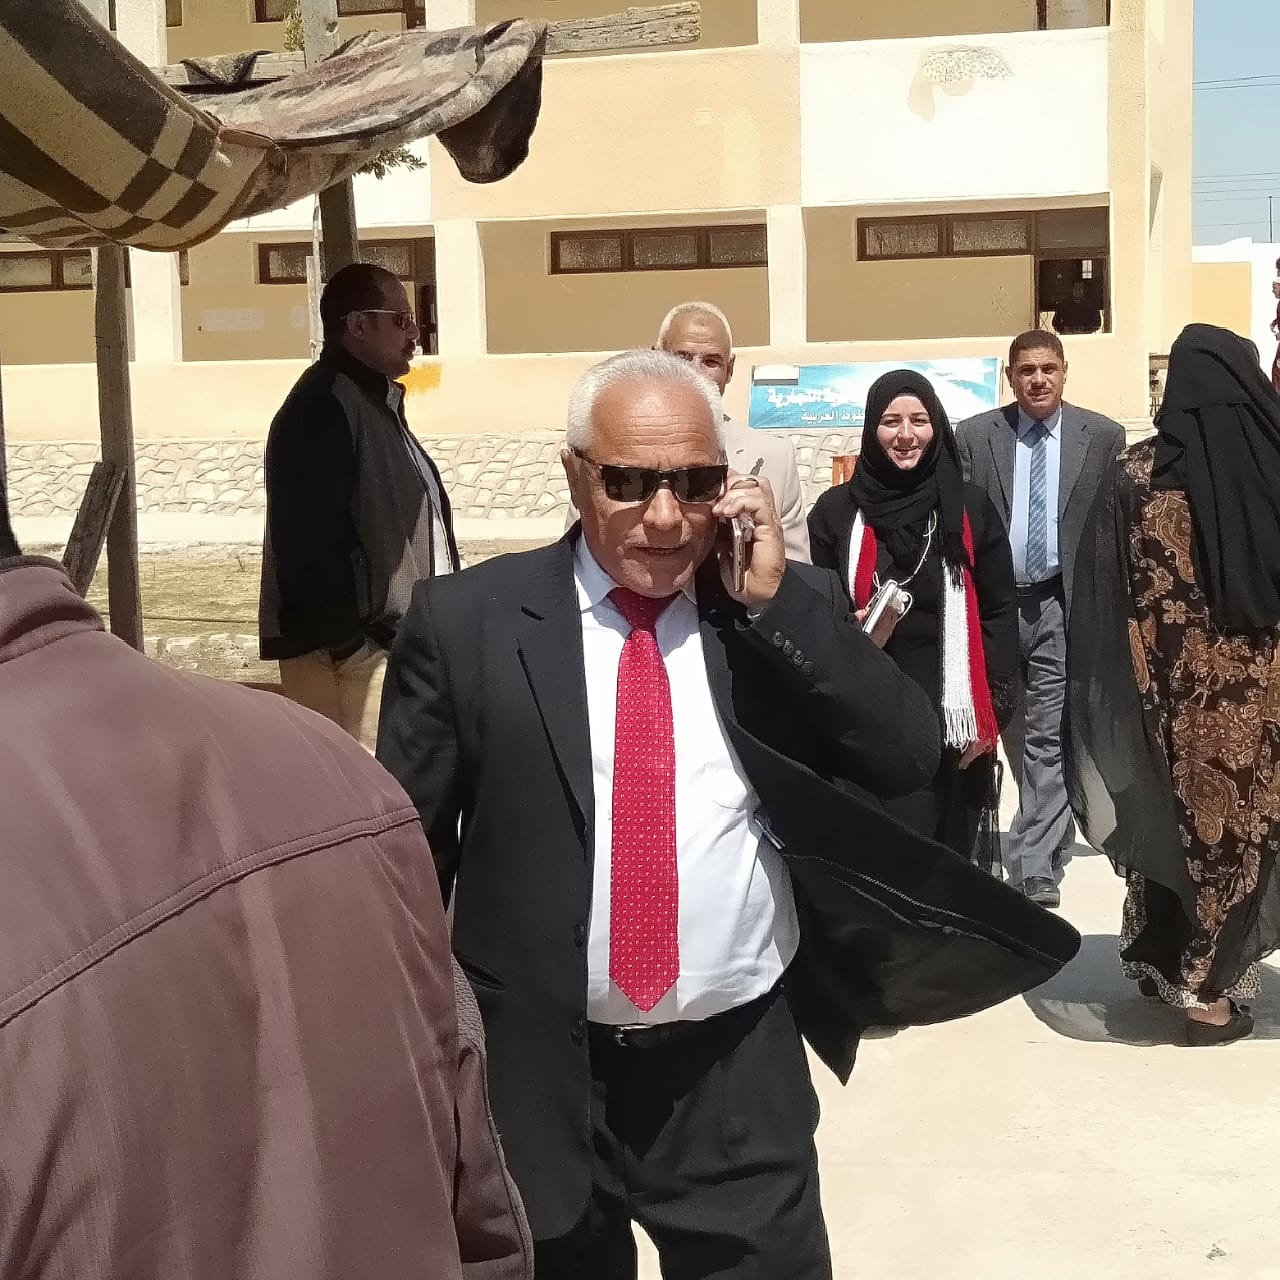 سليمان فرج ، نائب رئيس مركز ومدينة بئر العبد (3)